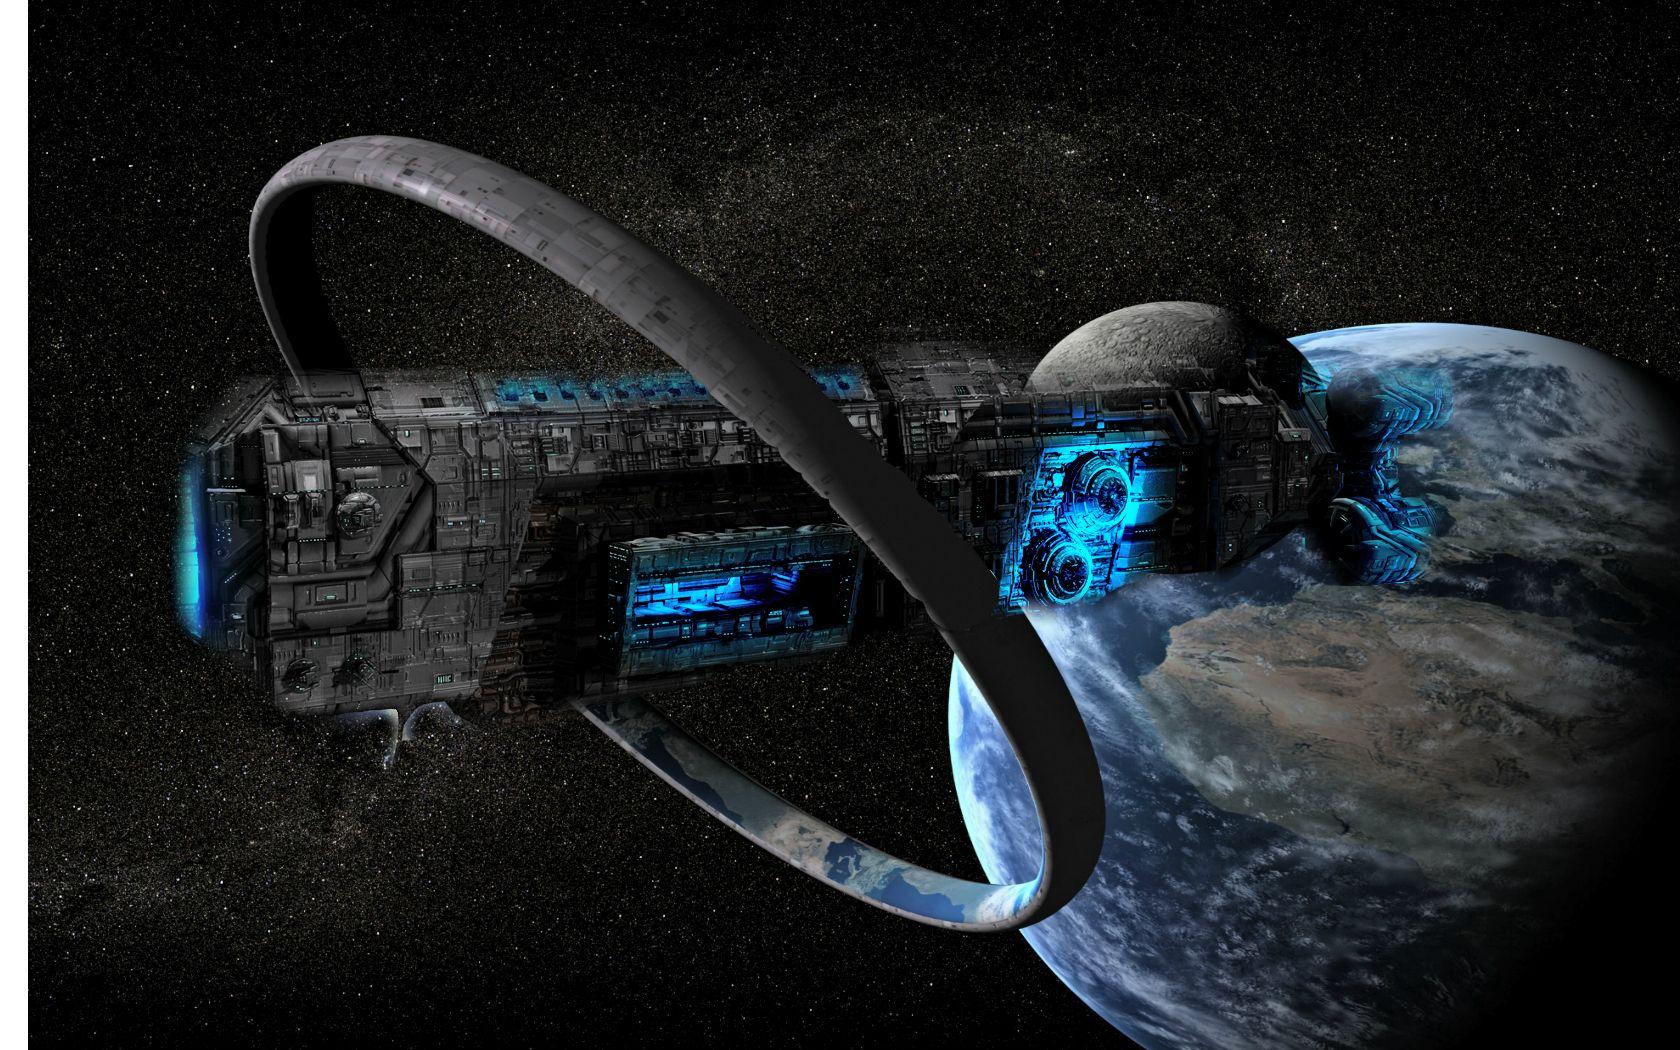 Pin von the engineer n m auf science fiction spaceship - Space wallpaper large ...